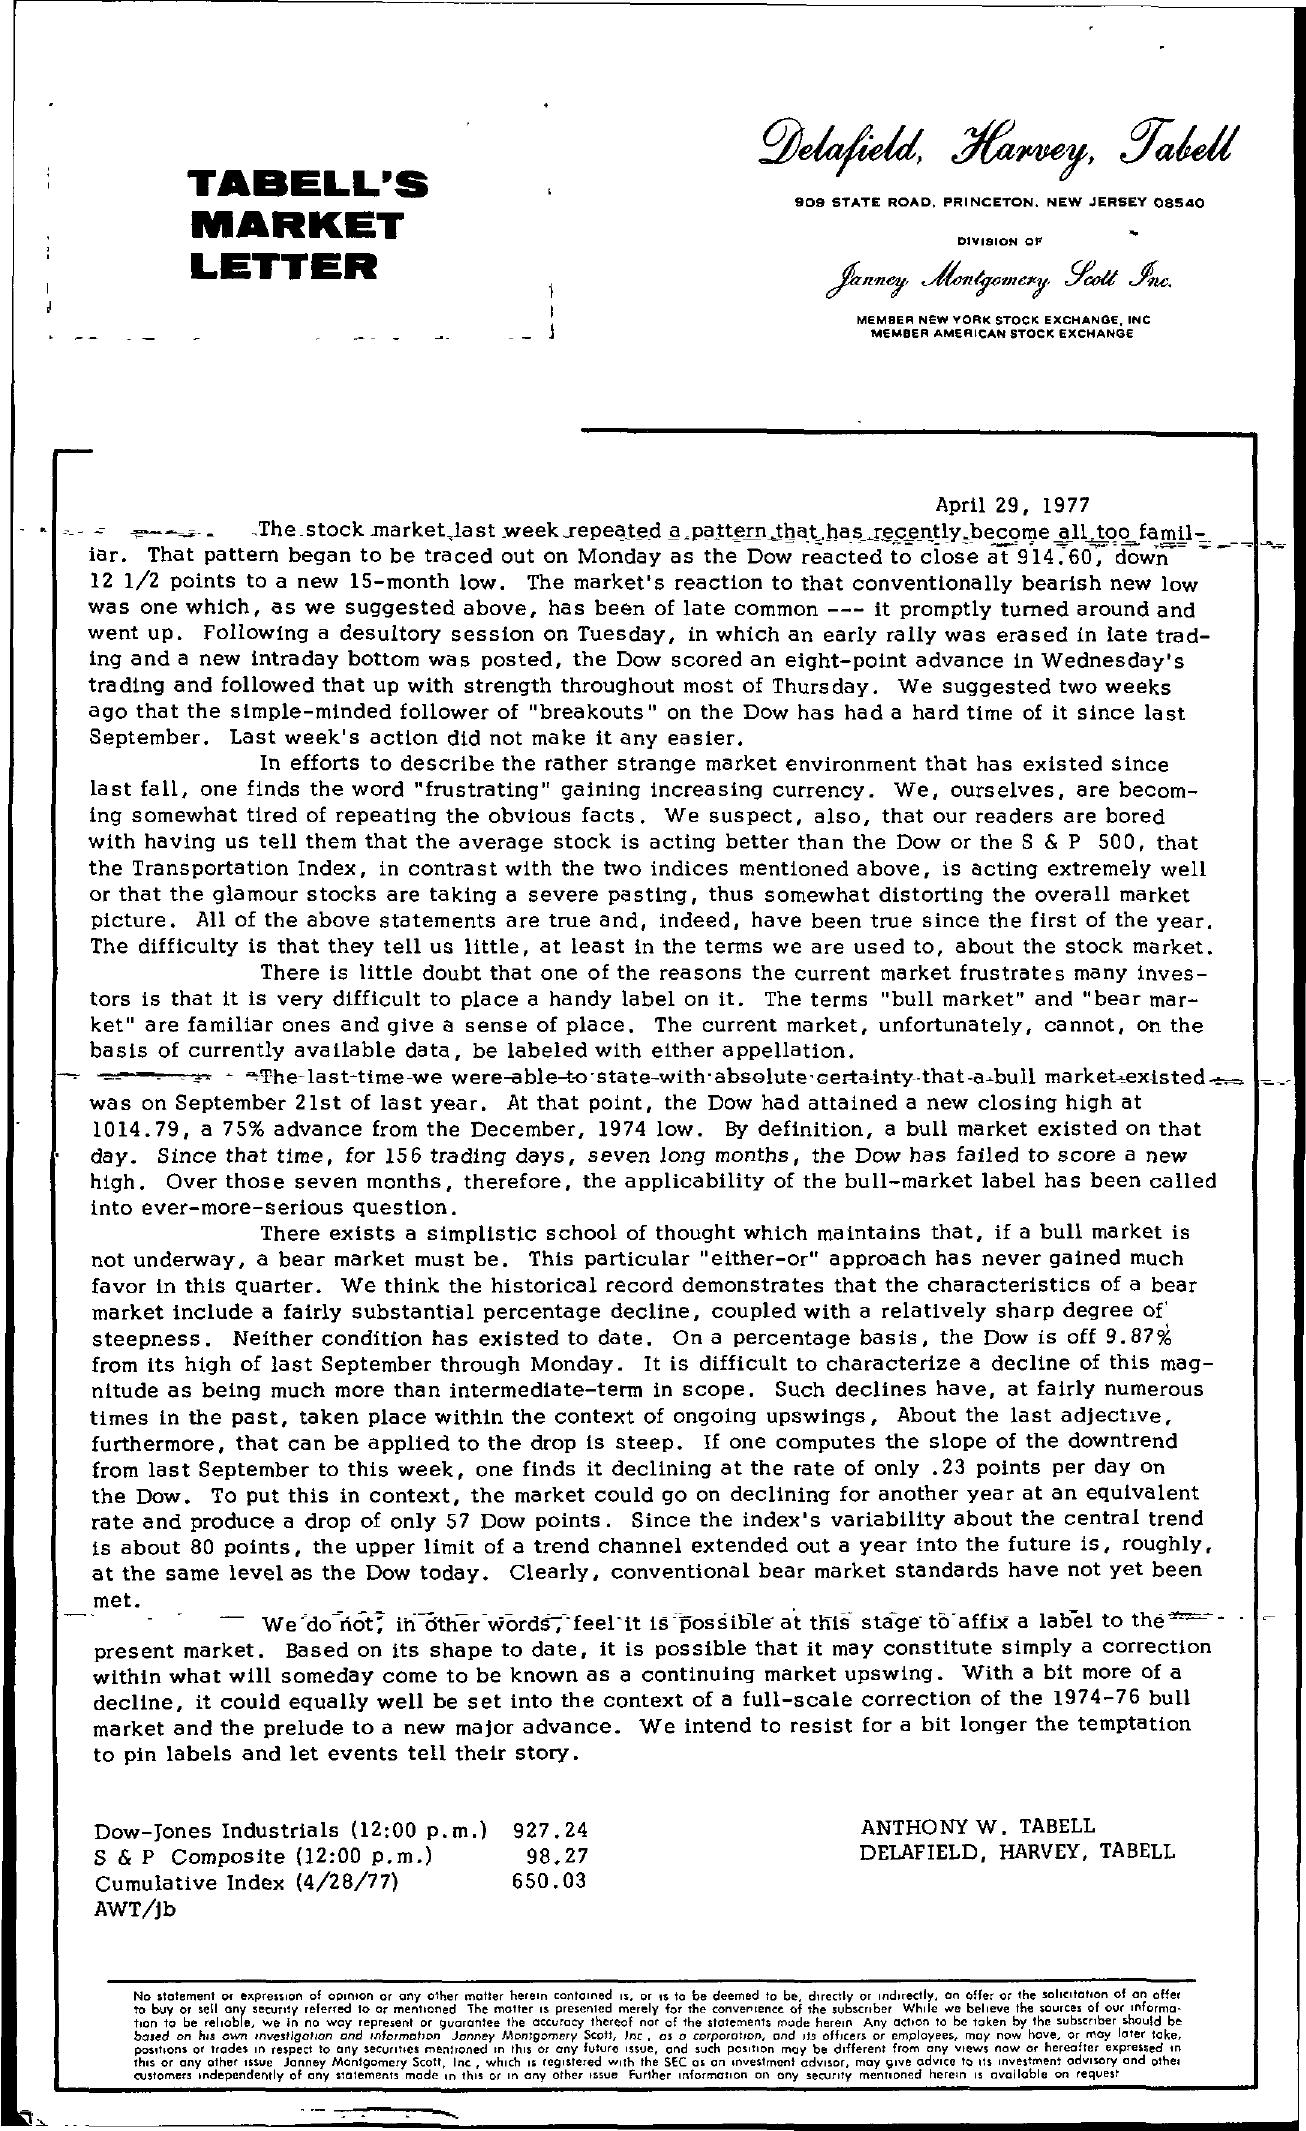 Tabell's Market Letter - April 29, 1977